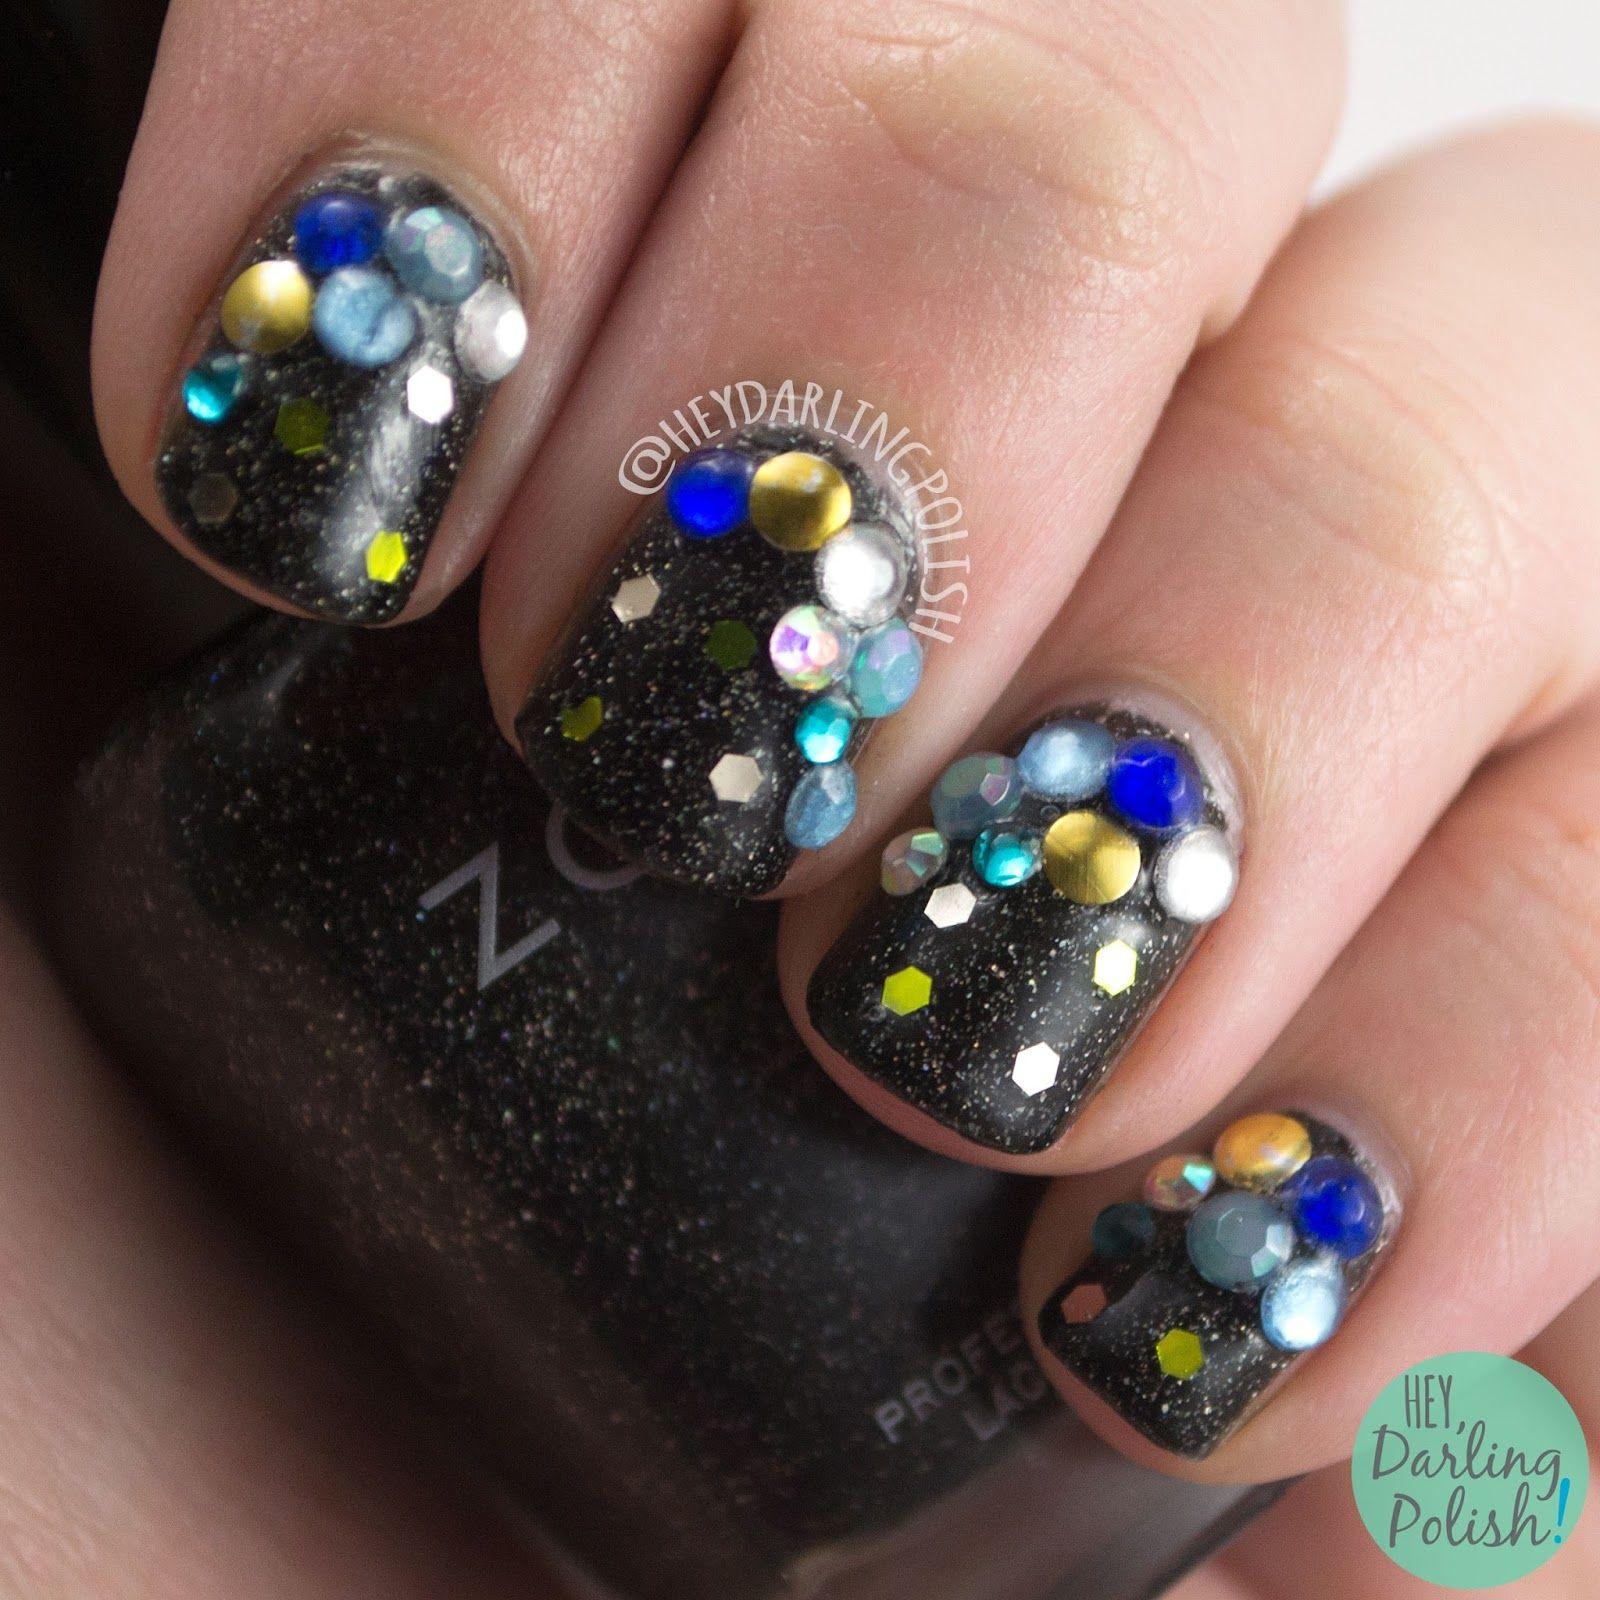 #nails, #nailart, #nailpolish, #heydarlingpolish, #rhinestones, #glequins, #sparkle,